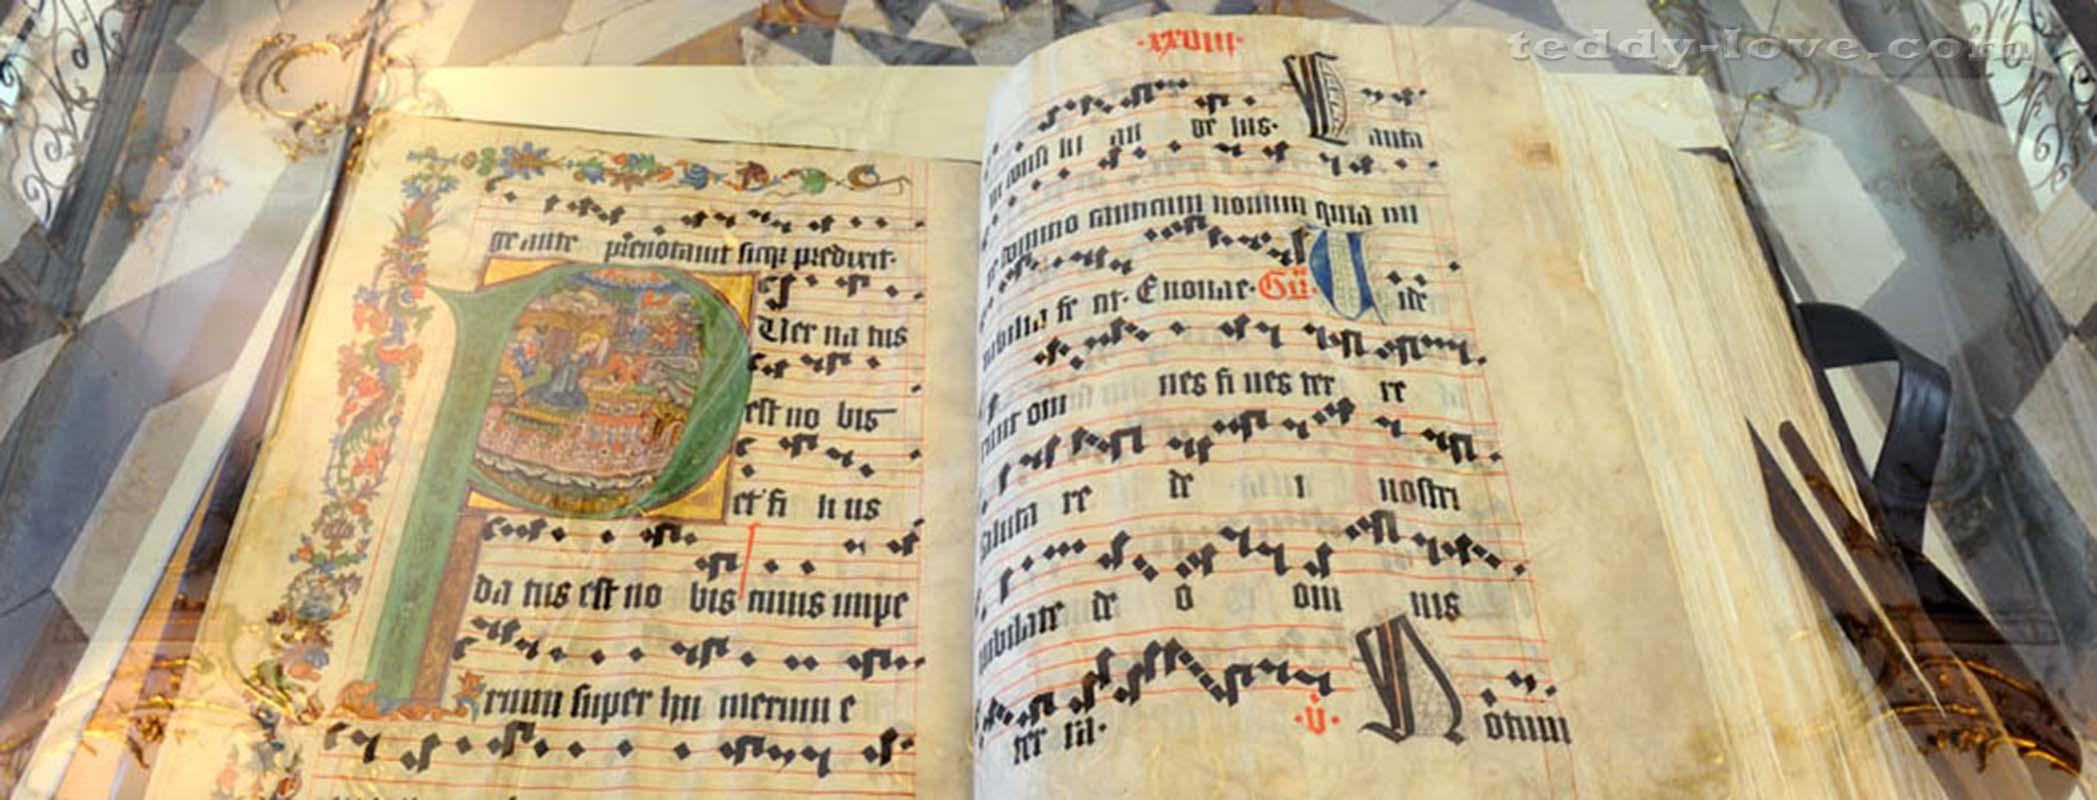 Нотная книга 14 века